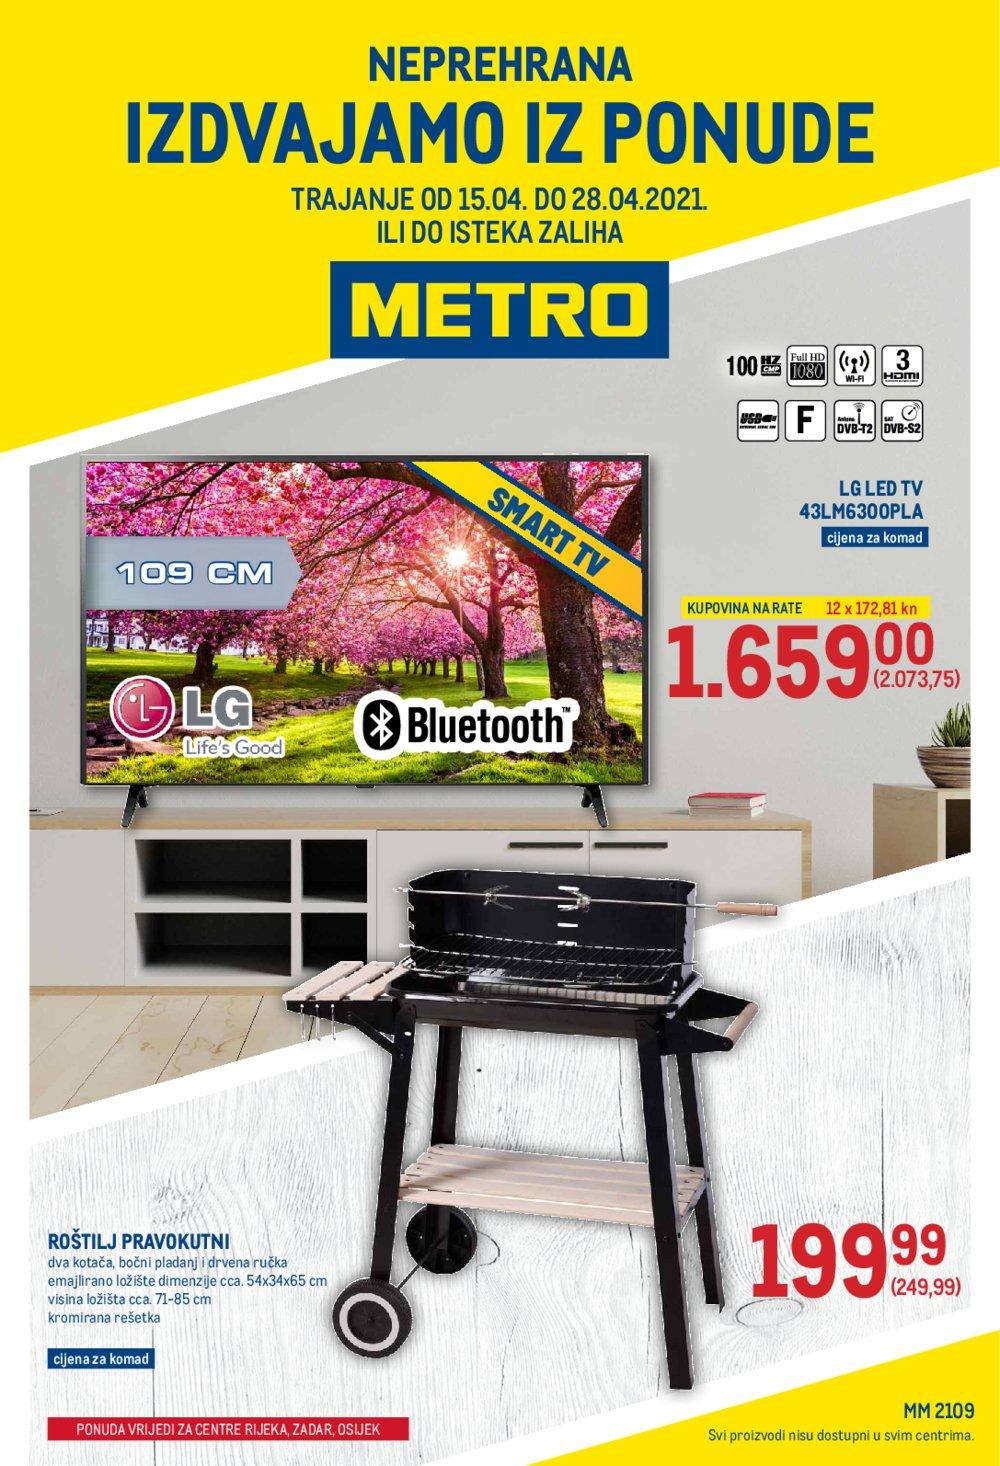 Metro katalog Akcija Neprehrana 15.04.-28.04.2021. Ri, Zd, Os